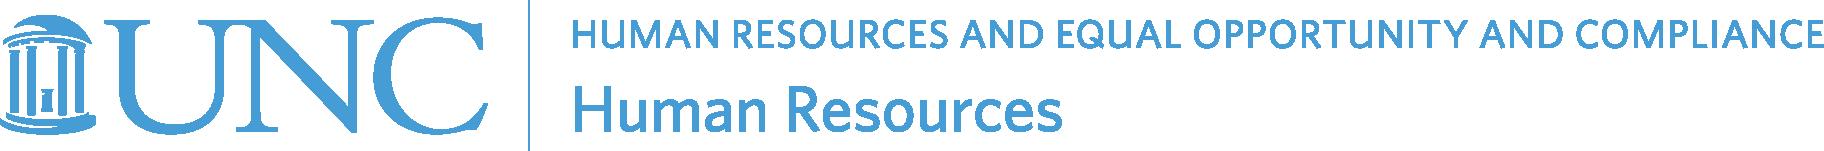 UNC Human Resources